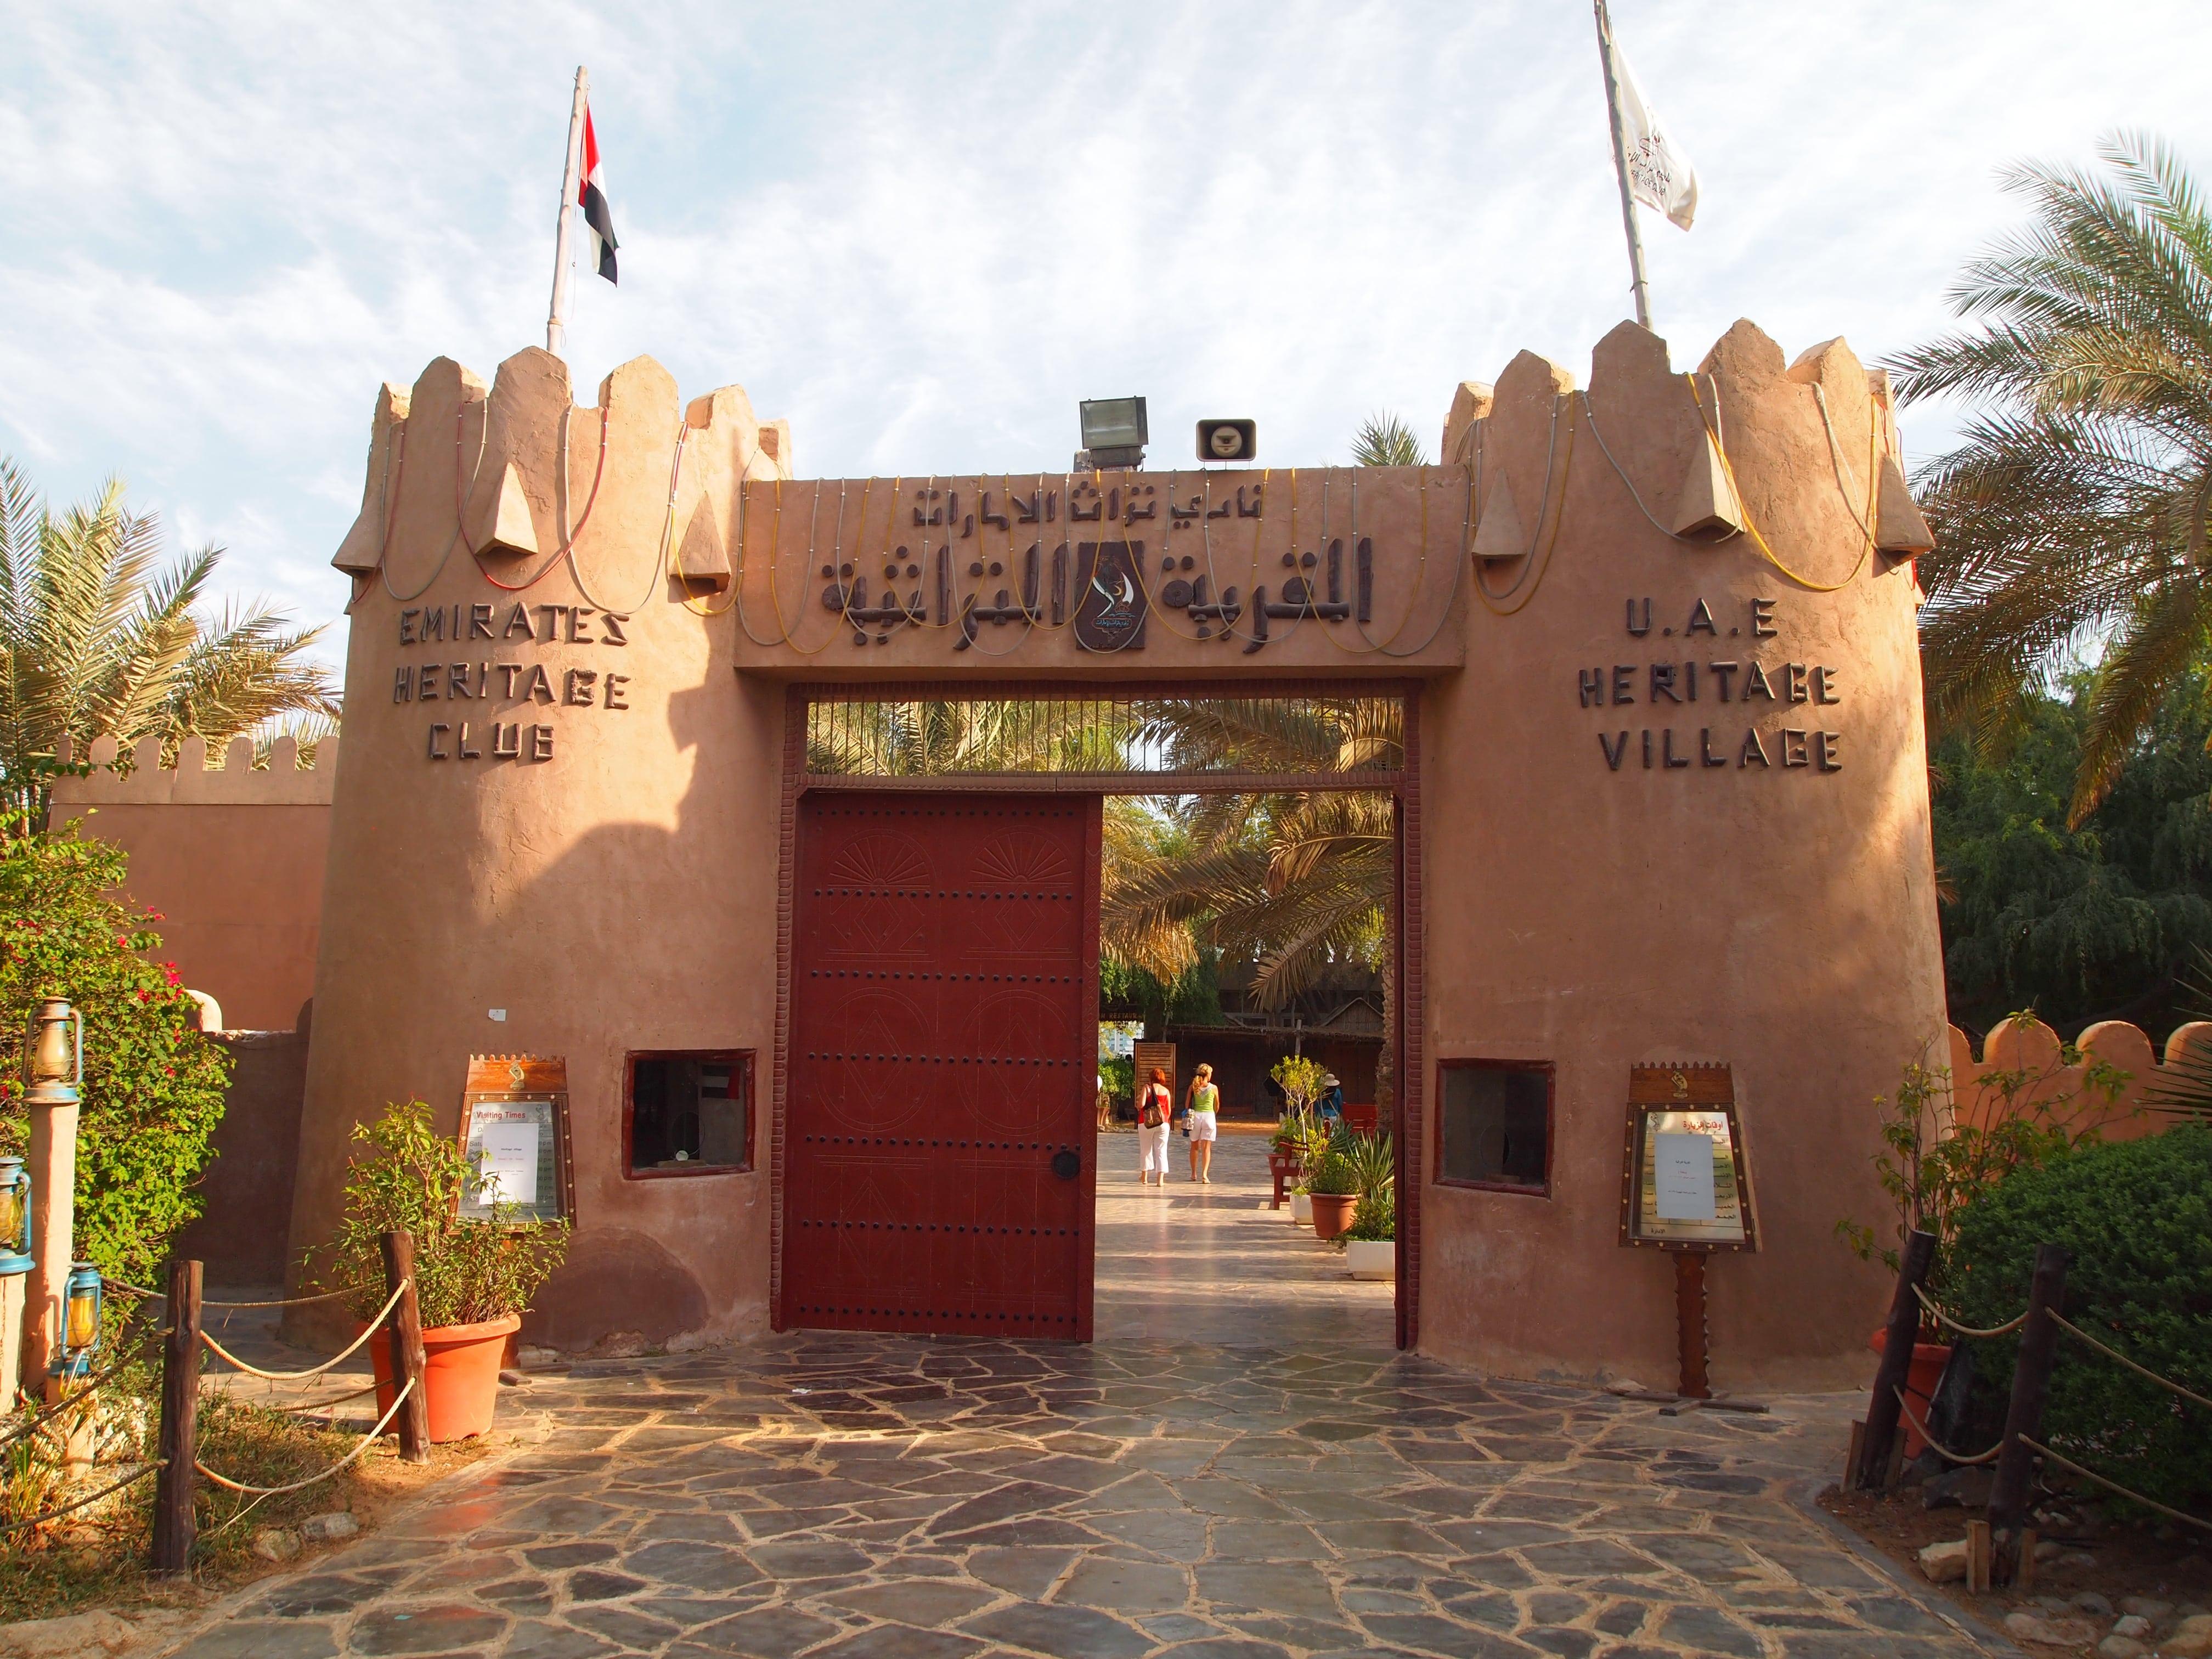 The Heritage village in Abu Dhabi